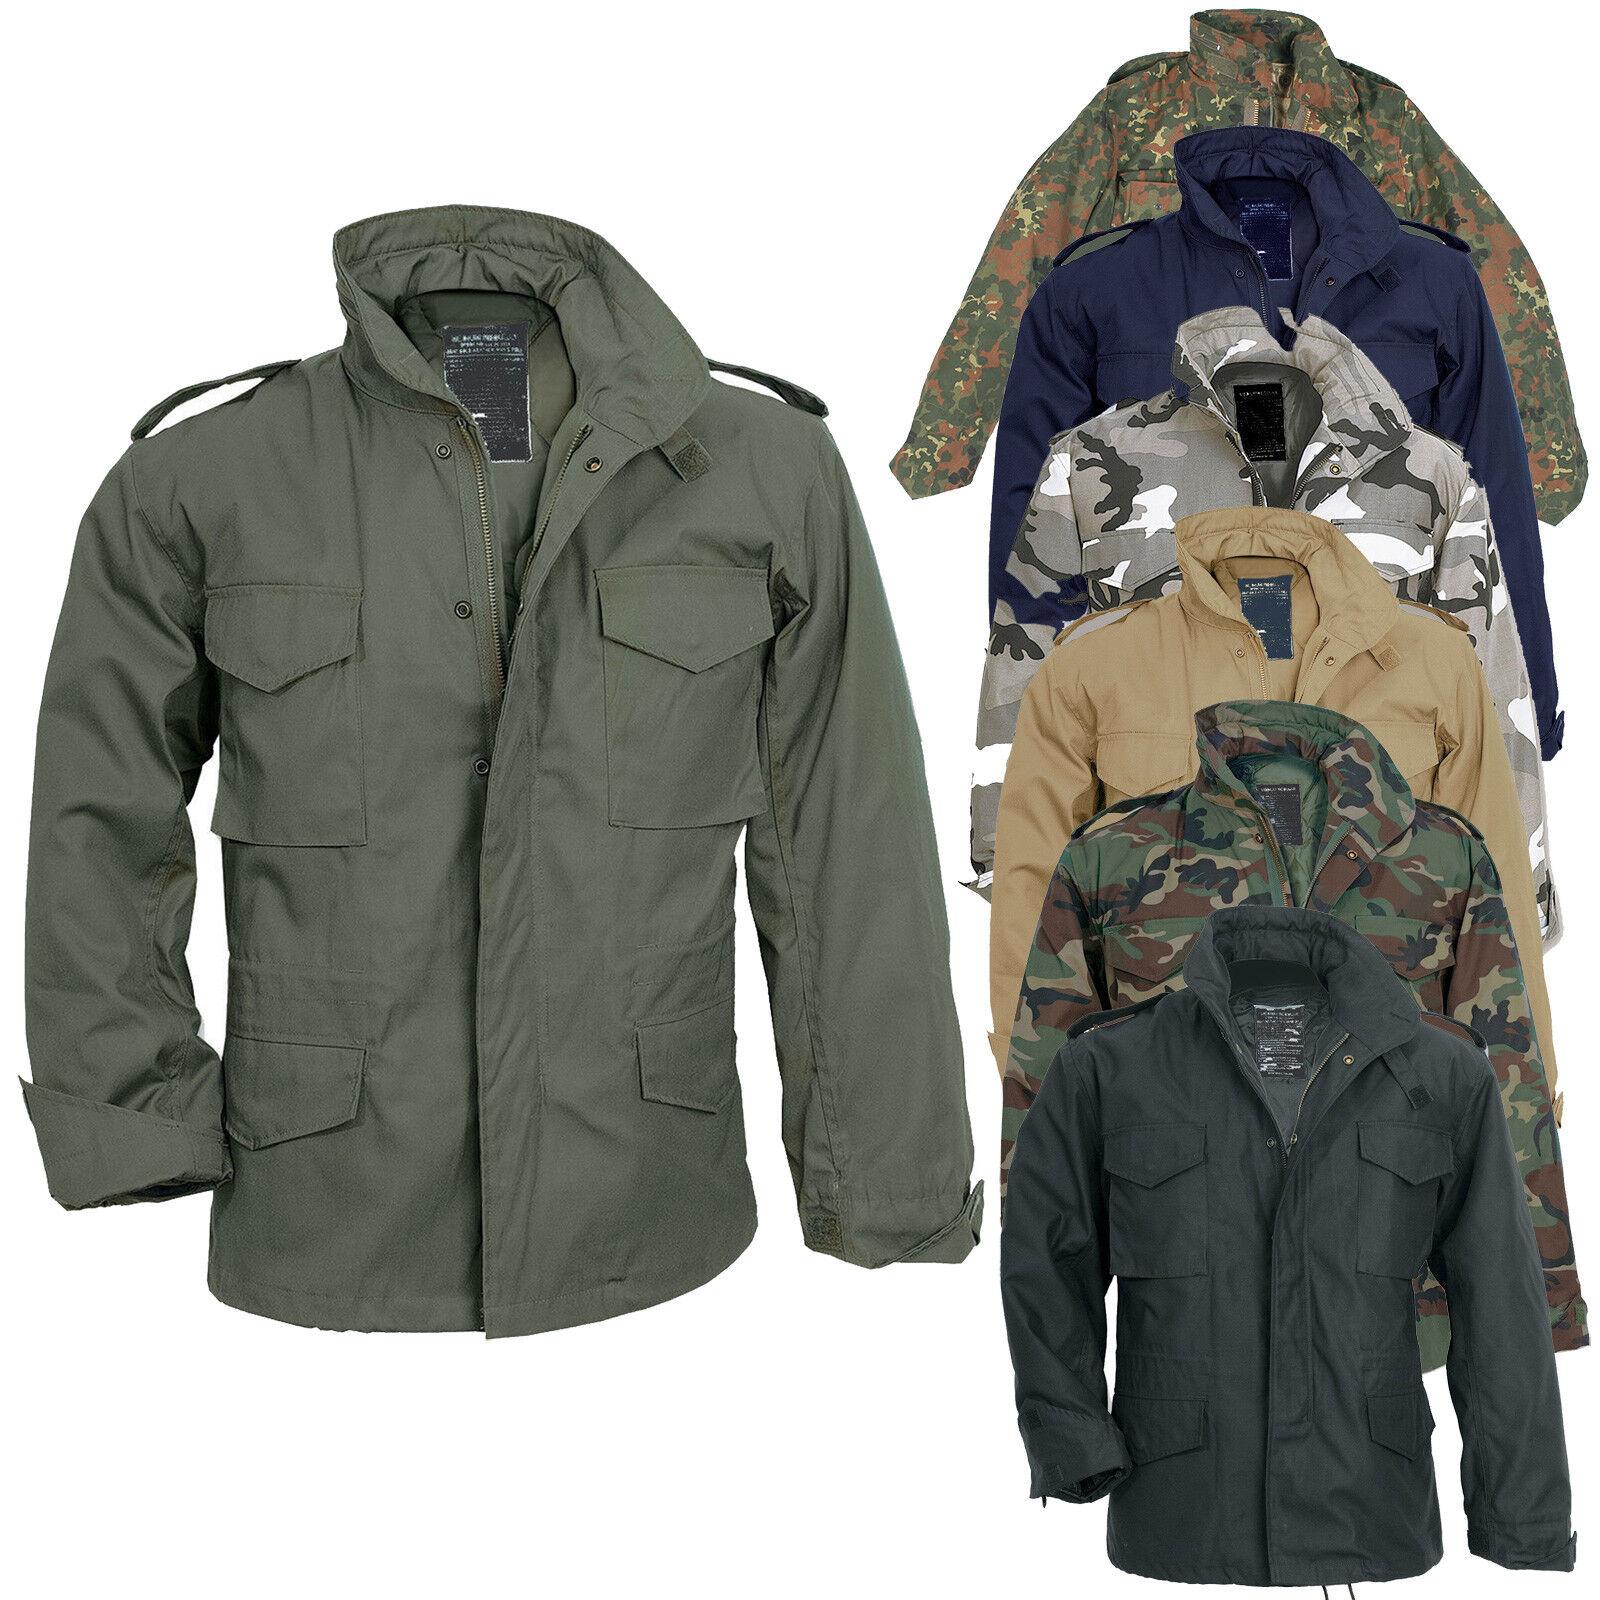 US Feldjacke M65 mit Futter S-7XL 7 Farben, Army Parka Fieldjacket Jacke tarn